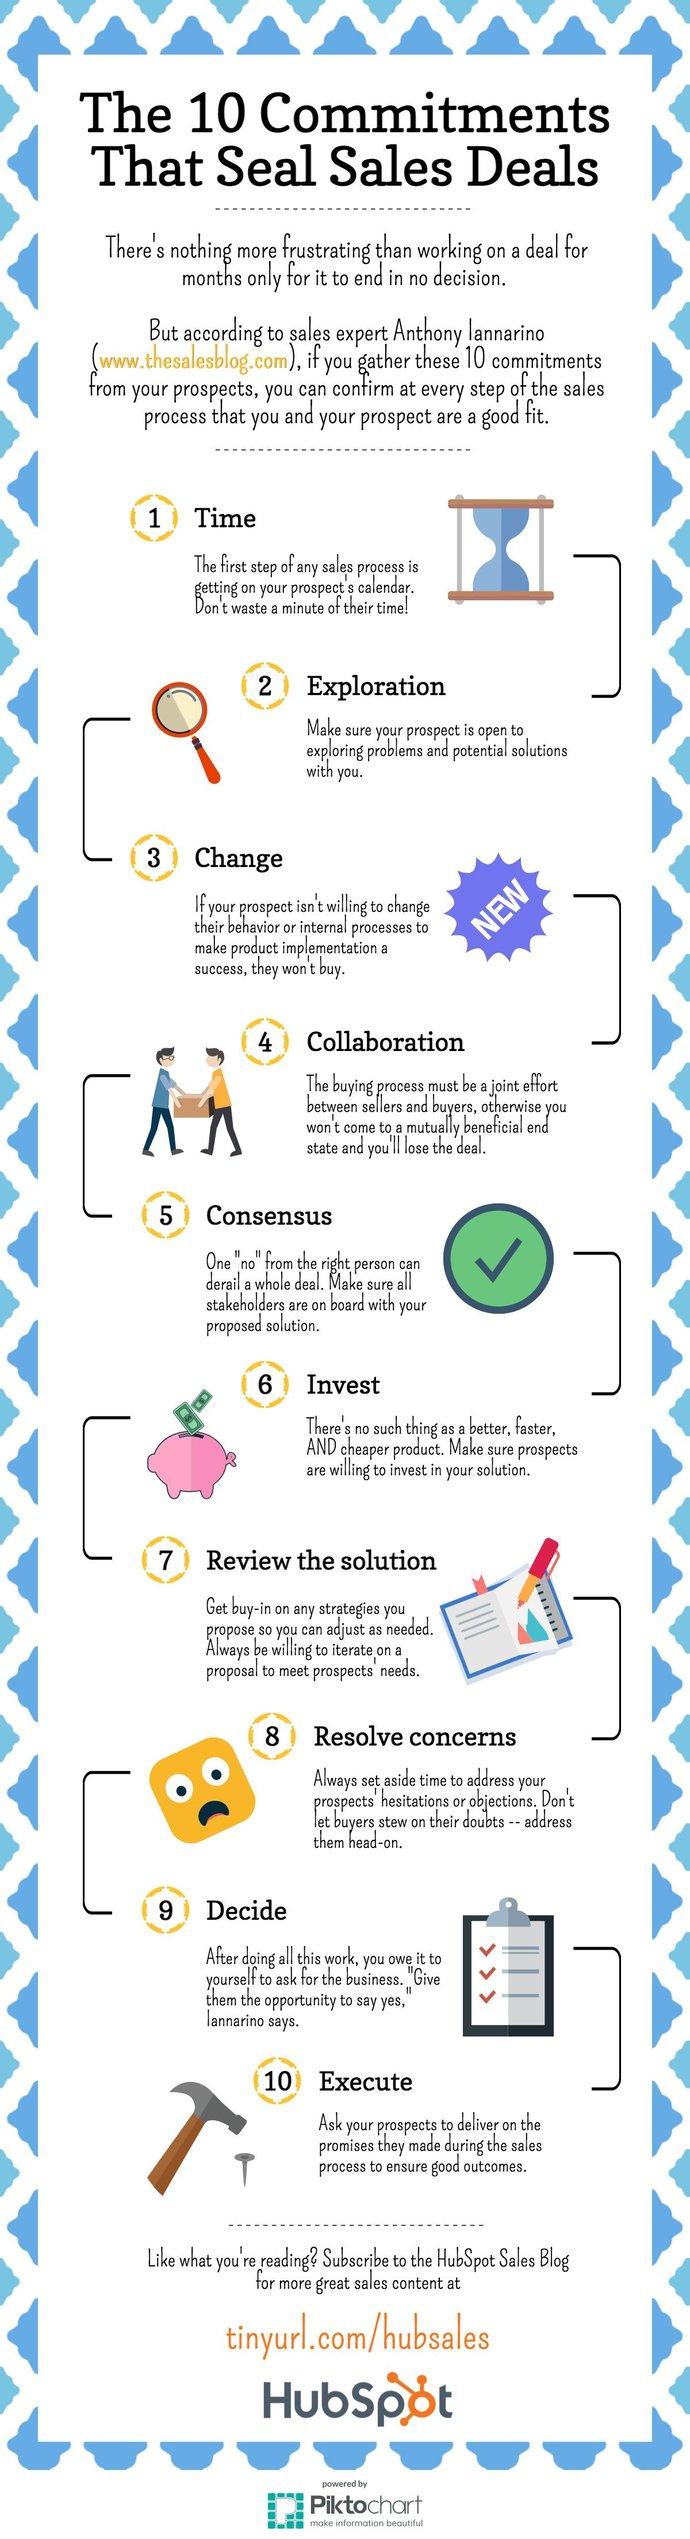 10-commitments-that-seal-sales-deals.jpeg